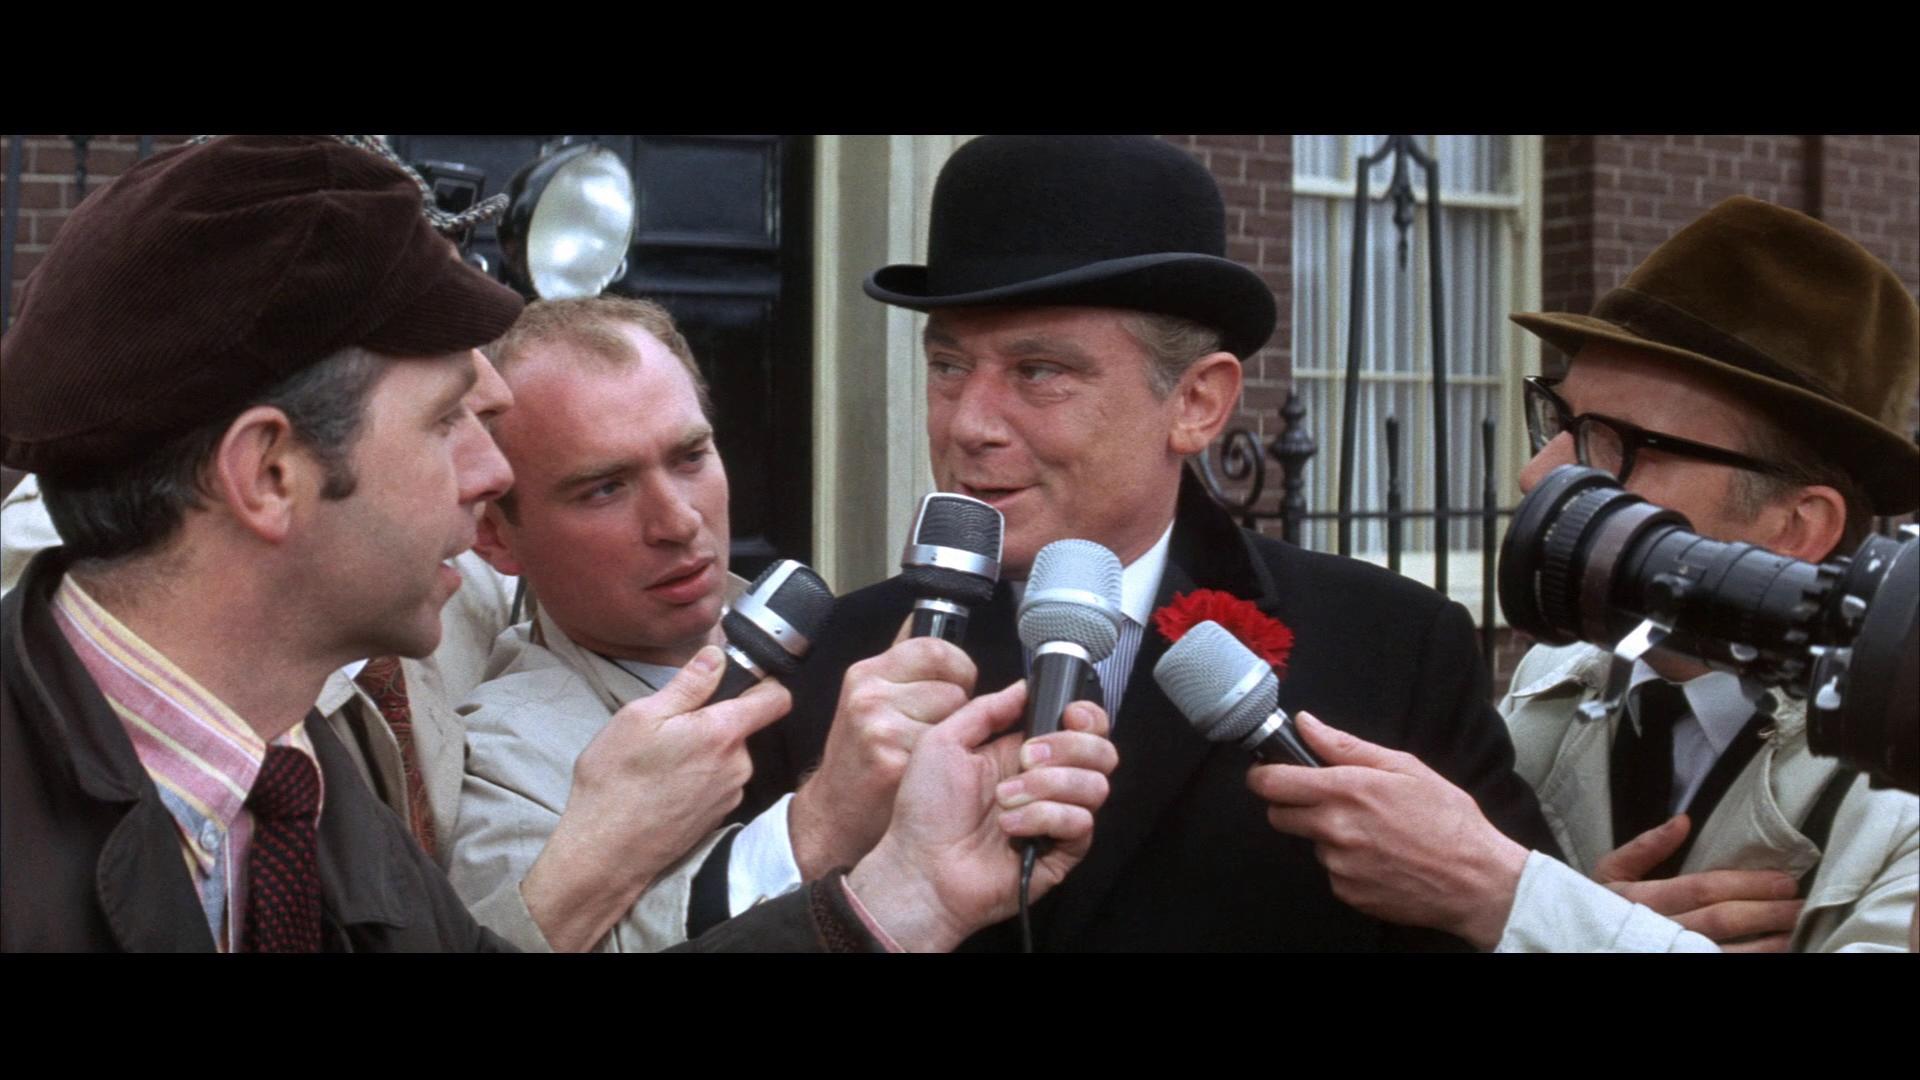 Patrick Cargill in Inspector Clouseau (1968)